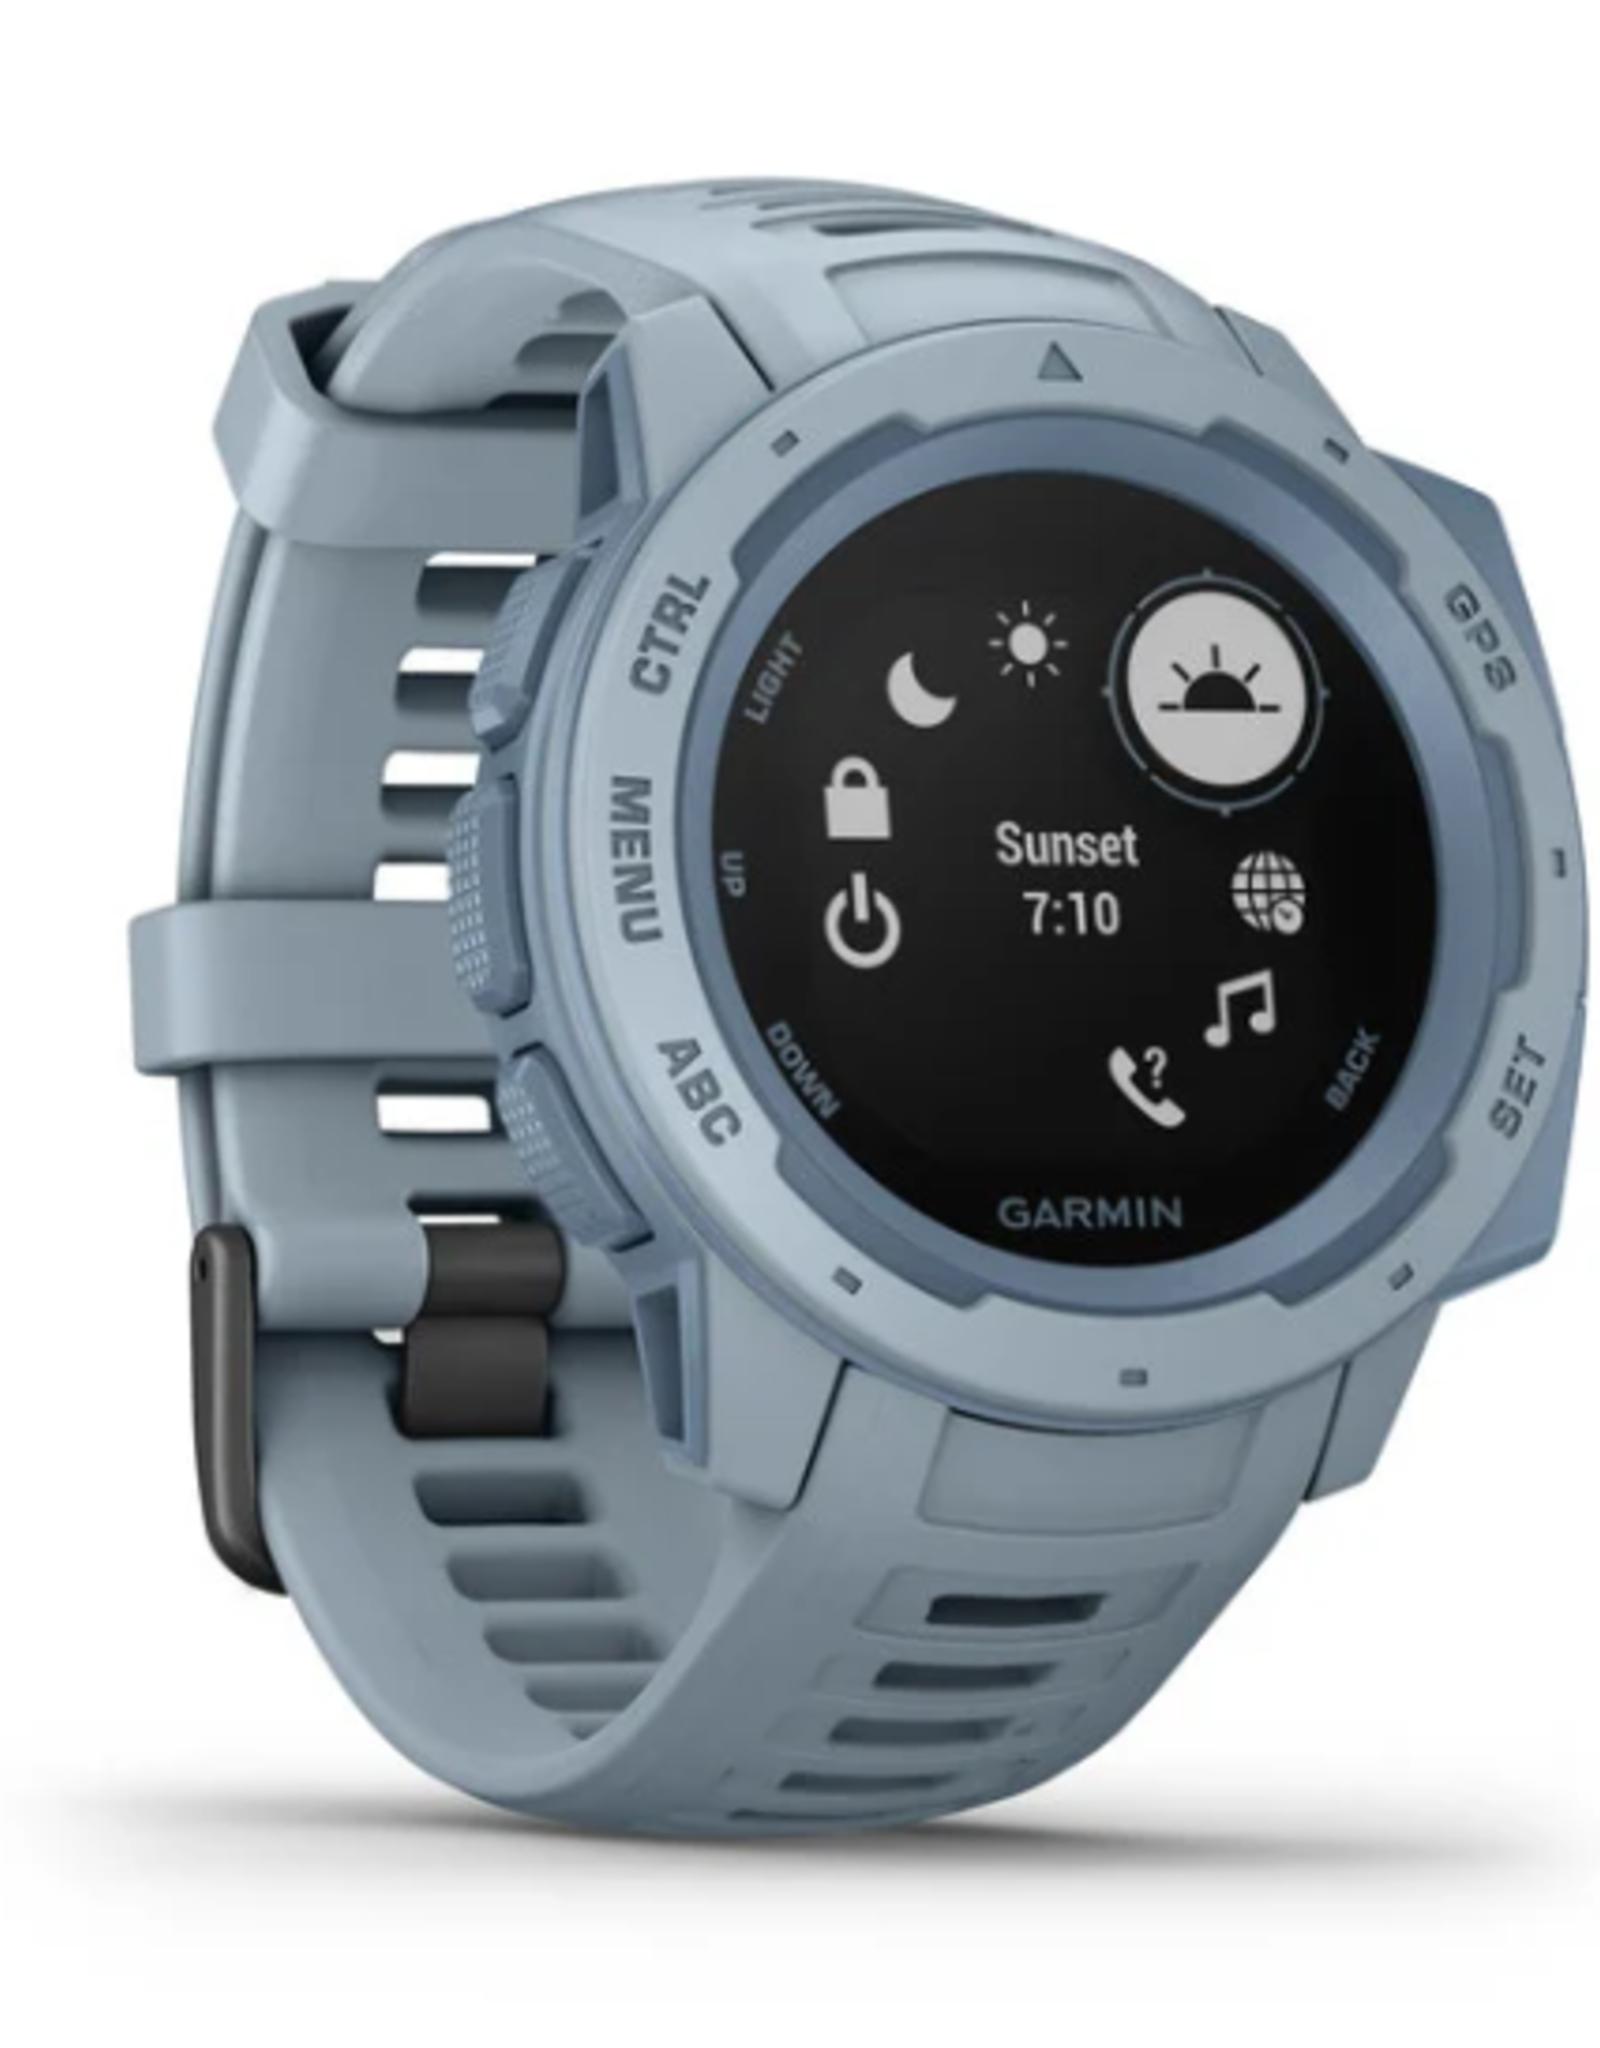 Garmin 010-2064 Instinct GPS Watch SEAFOAM